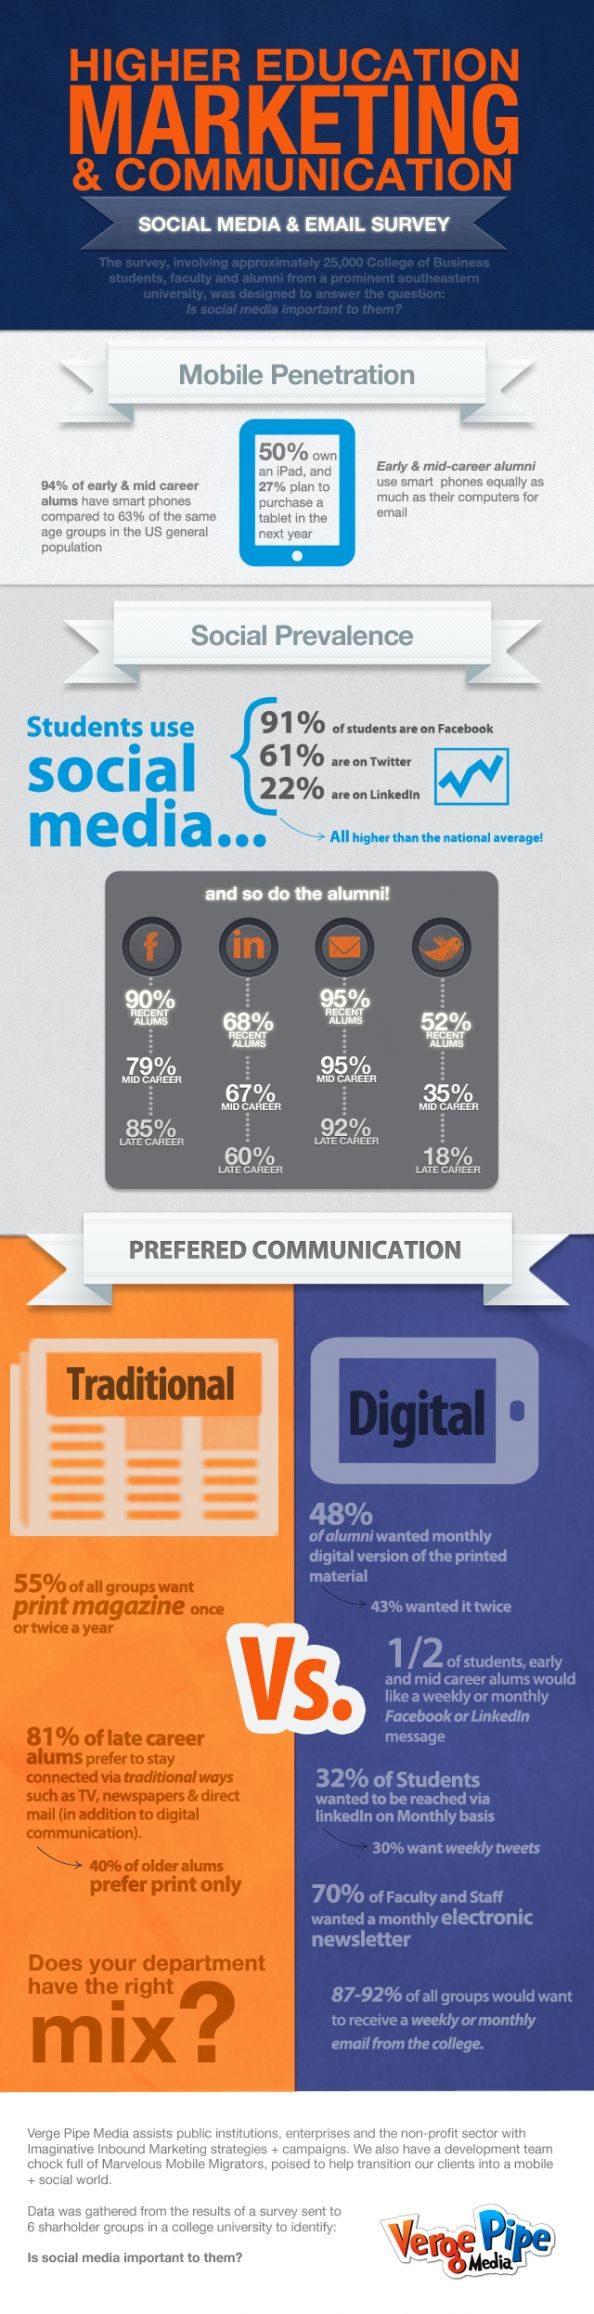 Higher Education #Marketing & #Communication Infographic